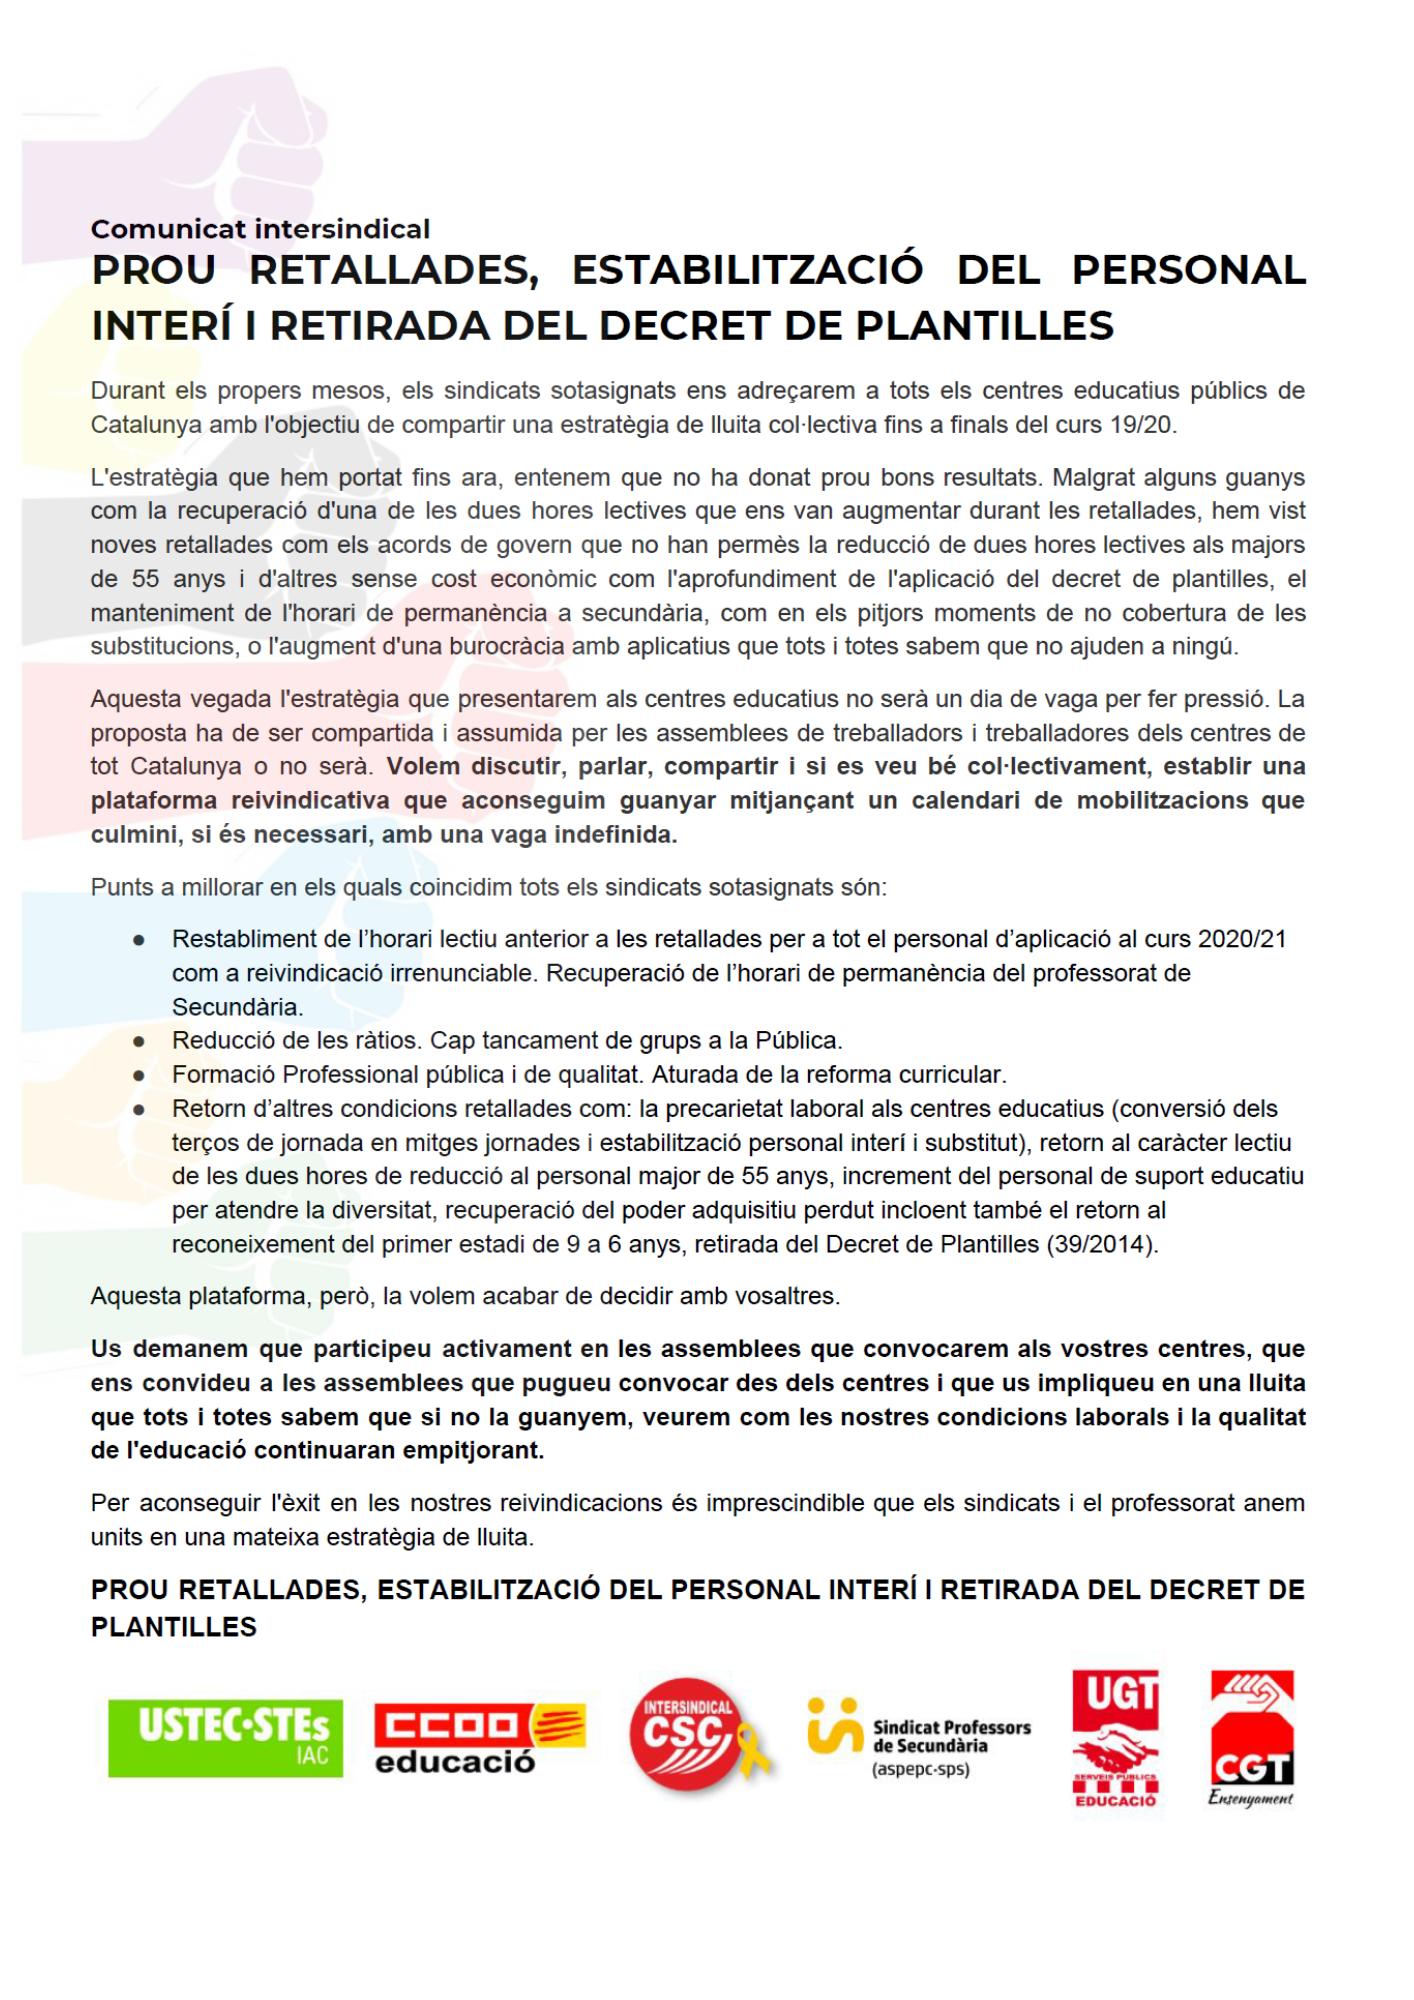 comunicat_intersindical.png